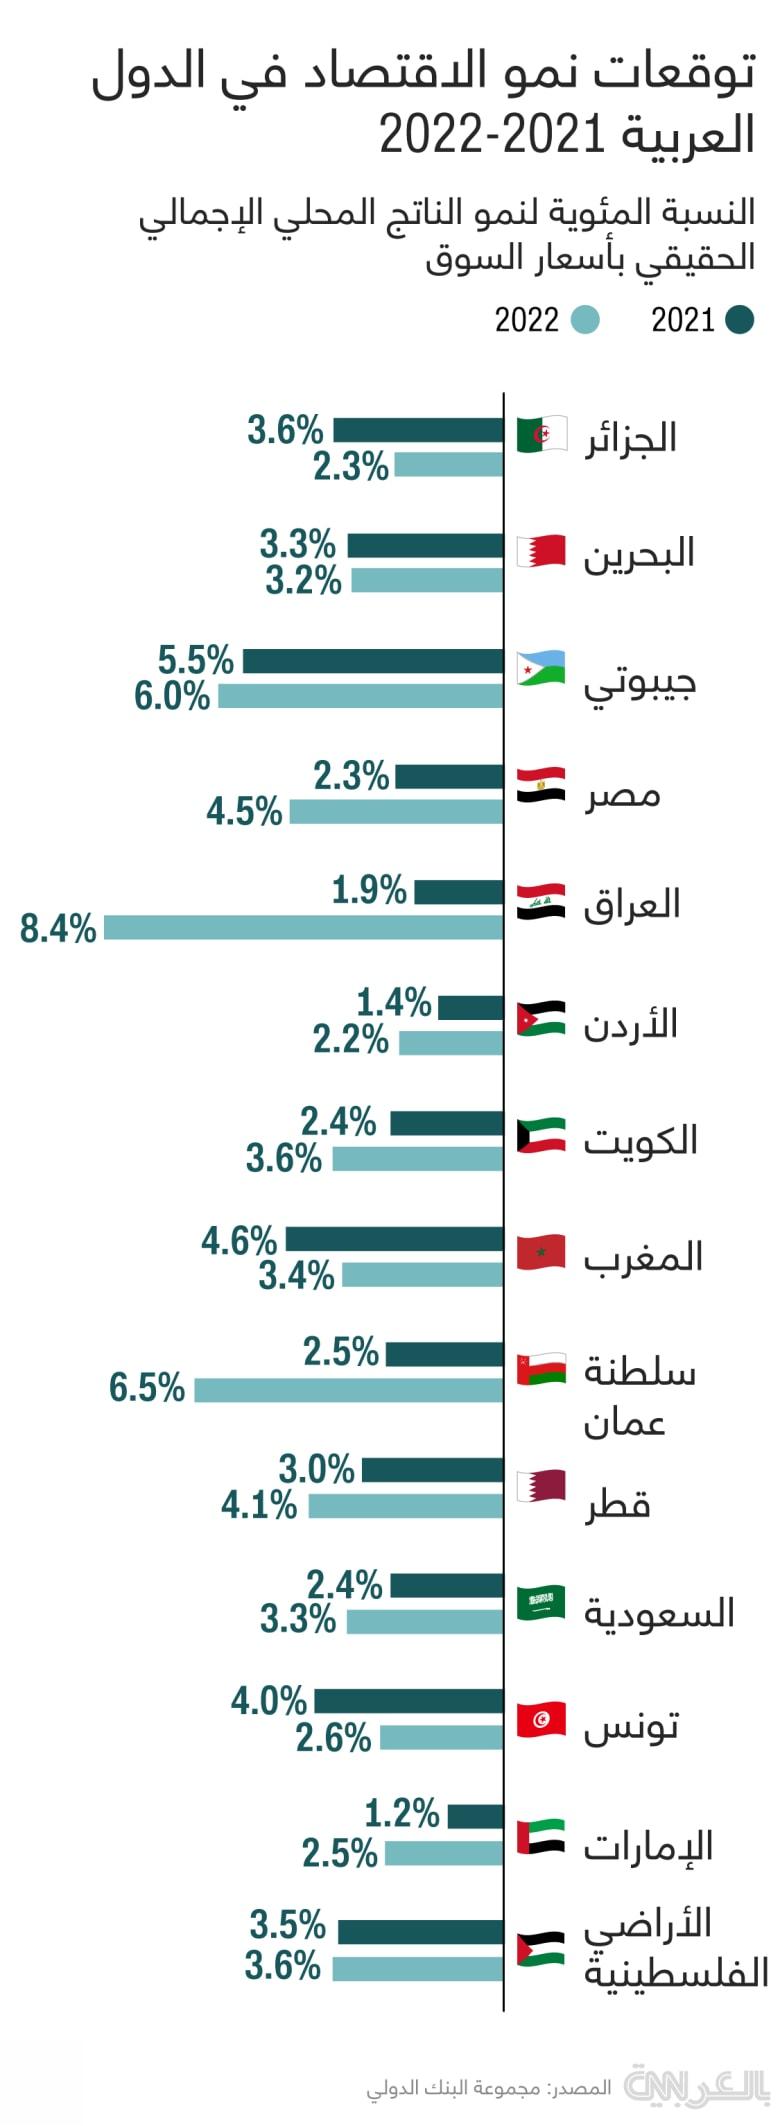 Economic-growth-forecasts-2021-2022